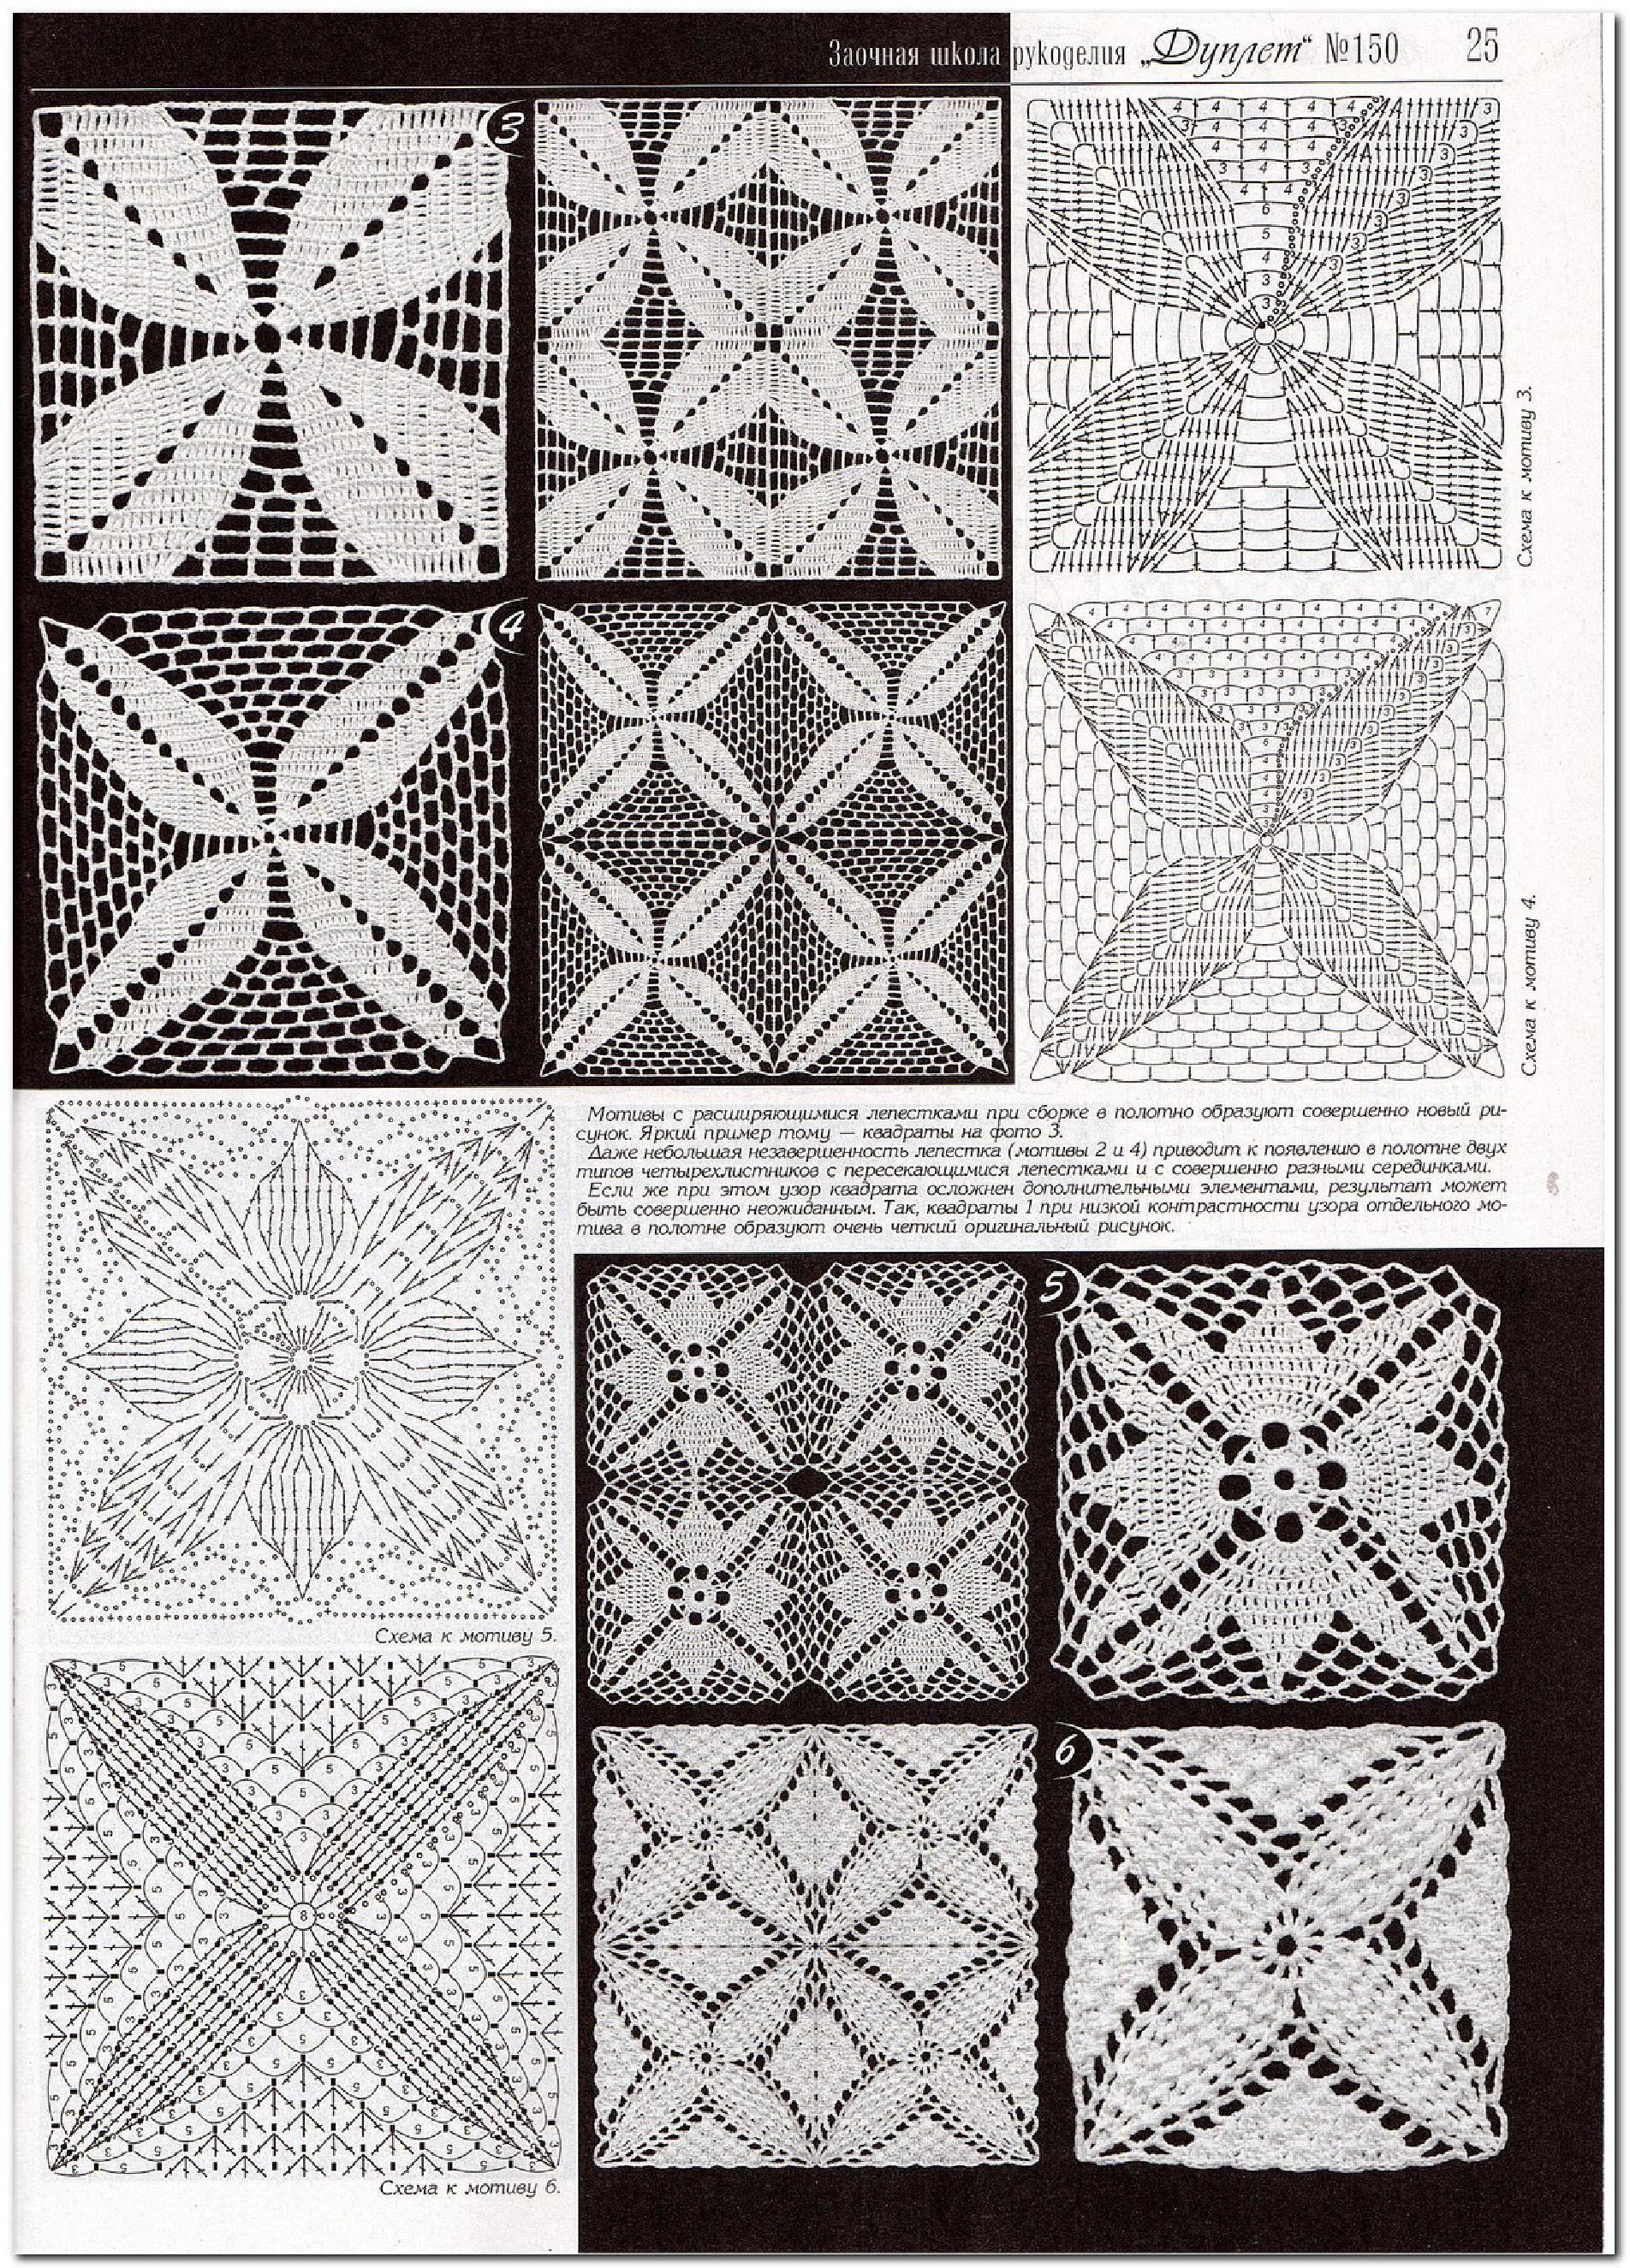 150DD13_38.jpg   häkelgardine vorlage   Pinterest   Muster ...